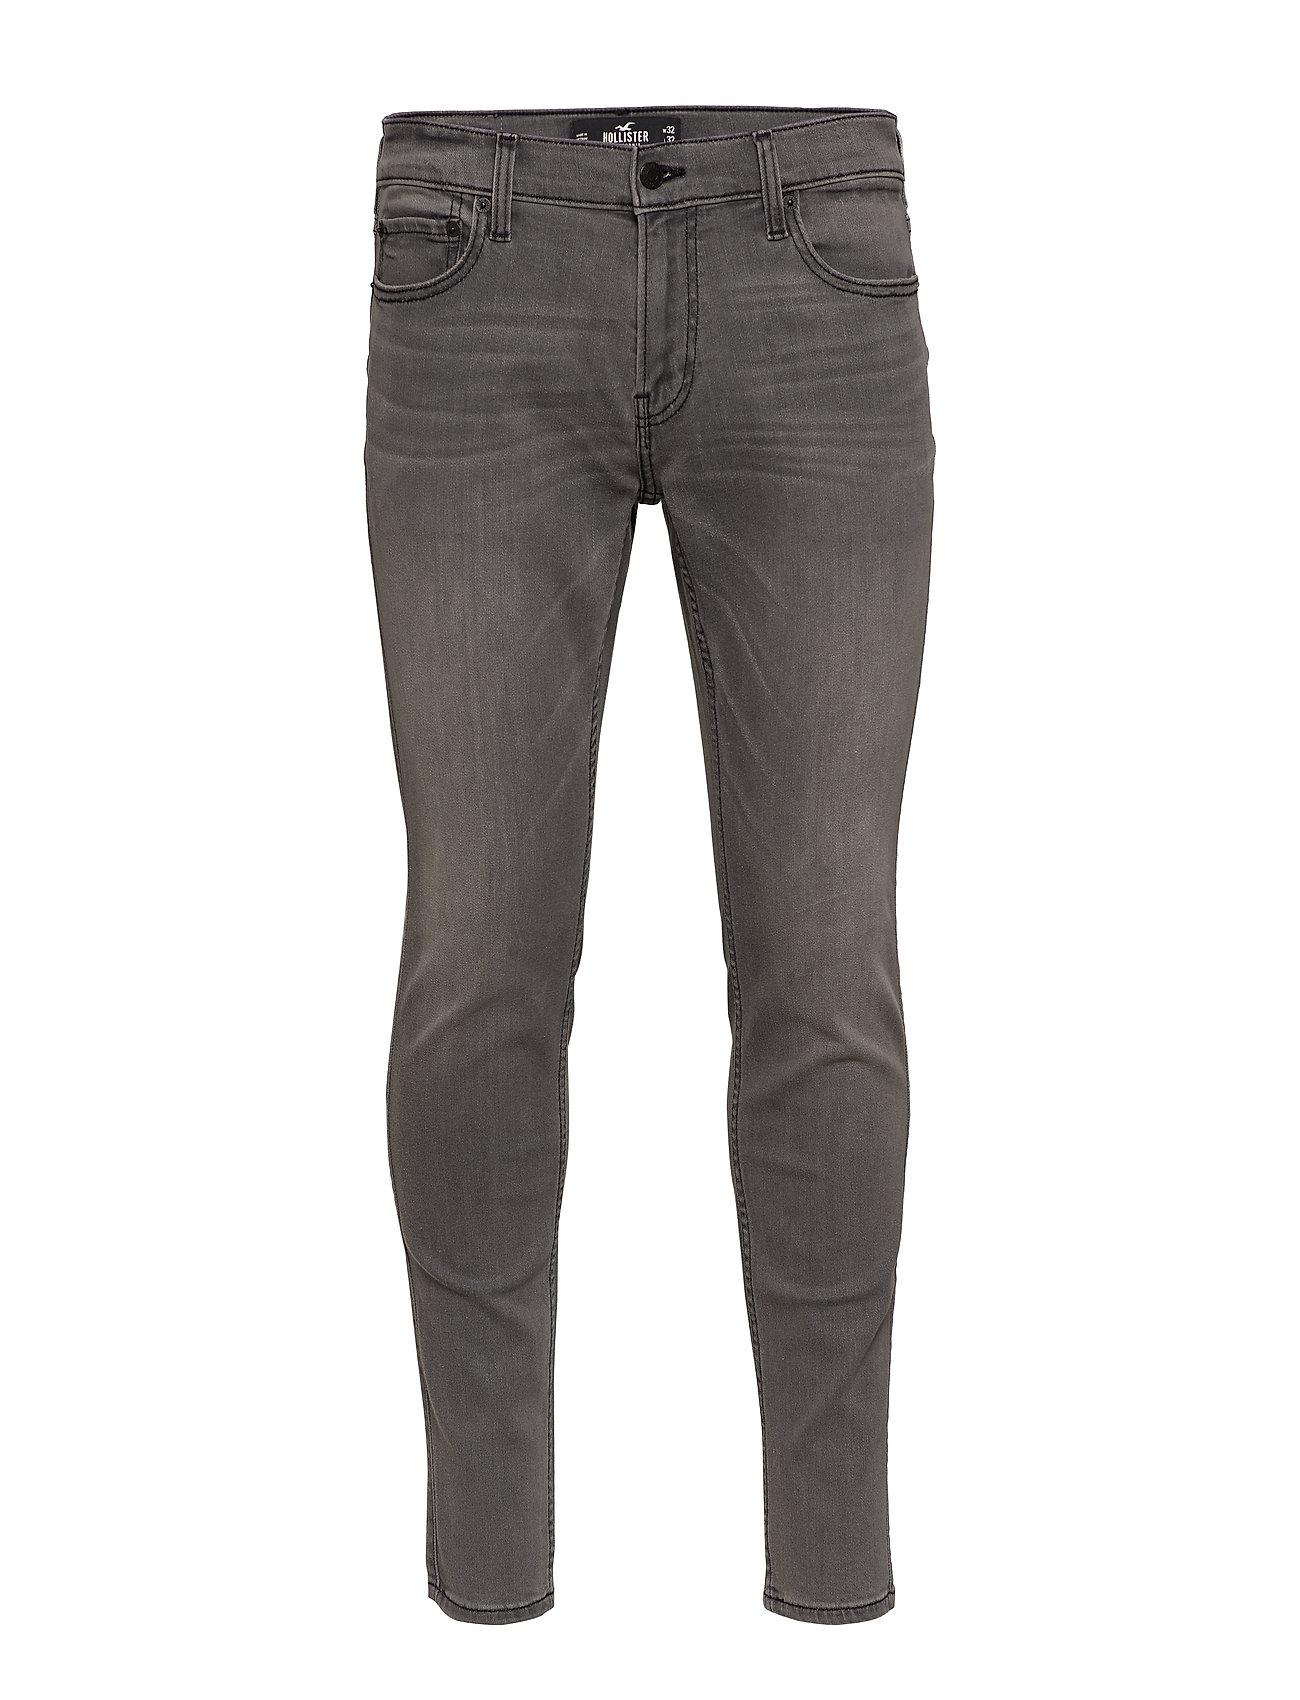 Hollister Skinny Jean - MID GREY